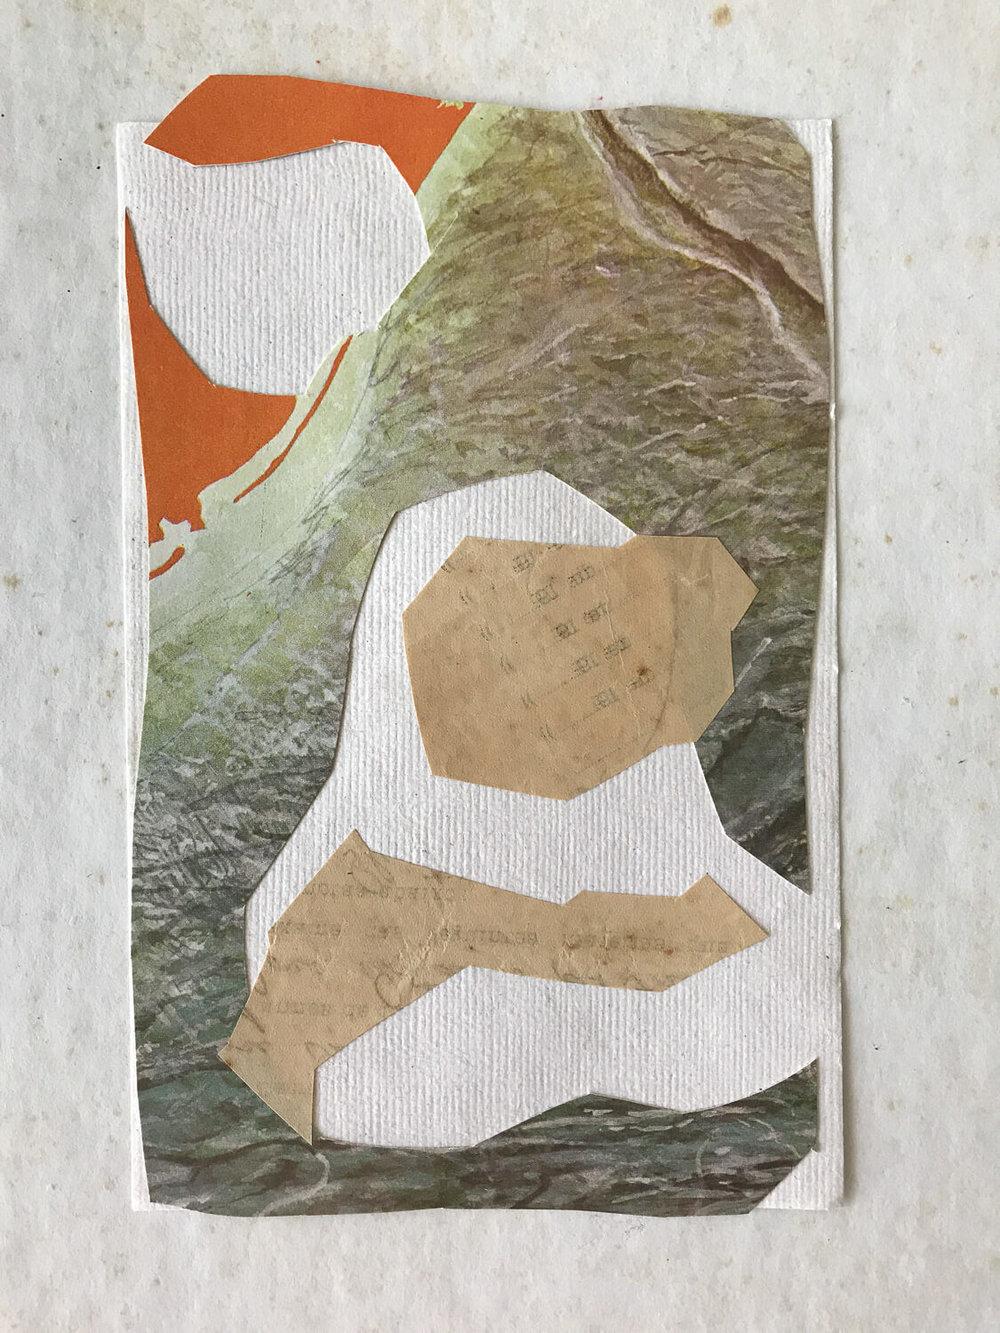 jay-paganini_20171016_untitled_02_00x00cm_paper-collage_web.jpg